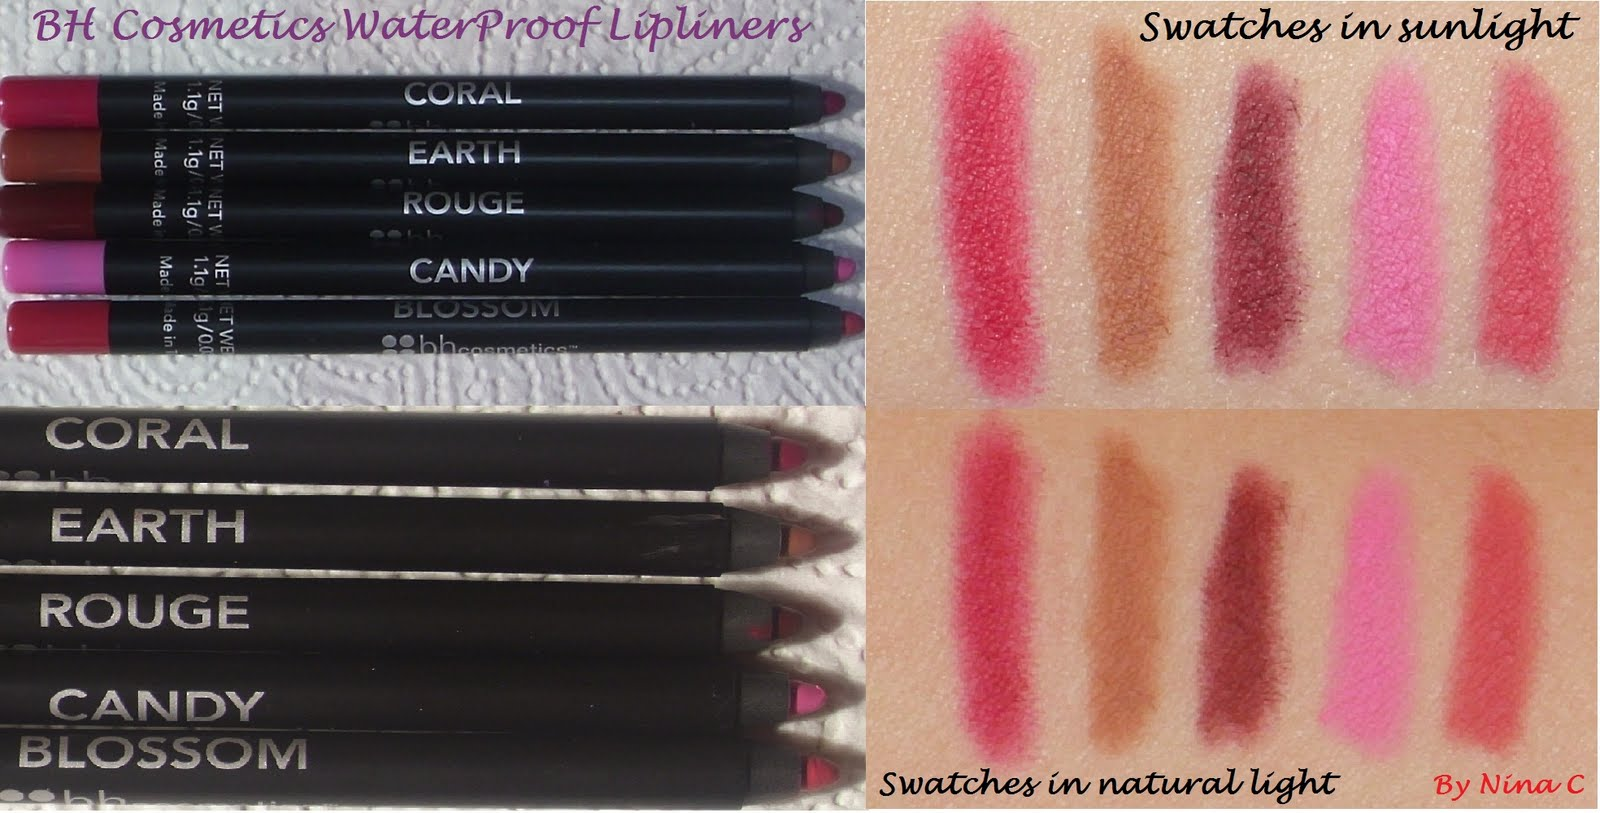 Waterproof Lip Liner by BH Cosmetics #3